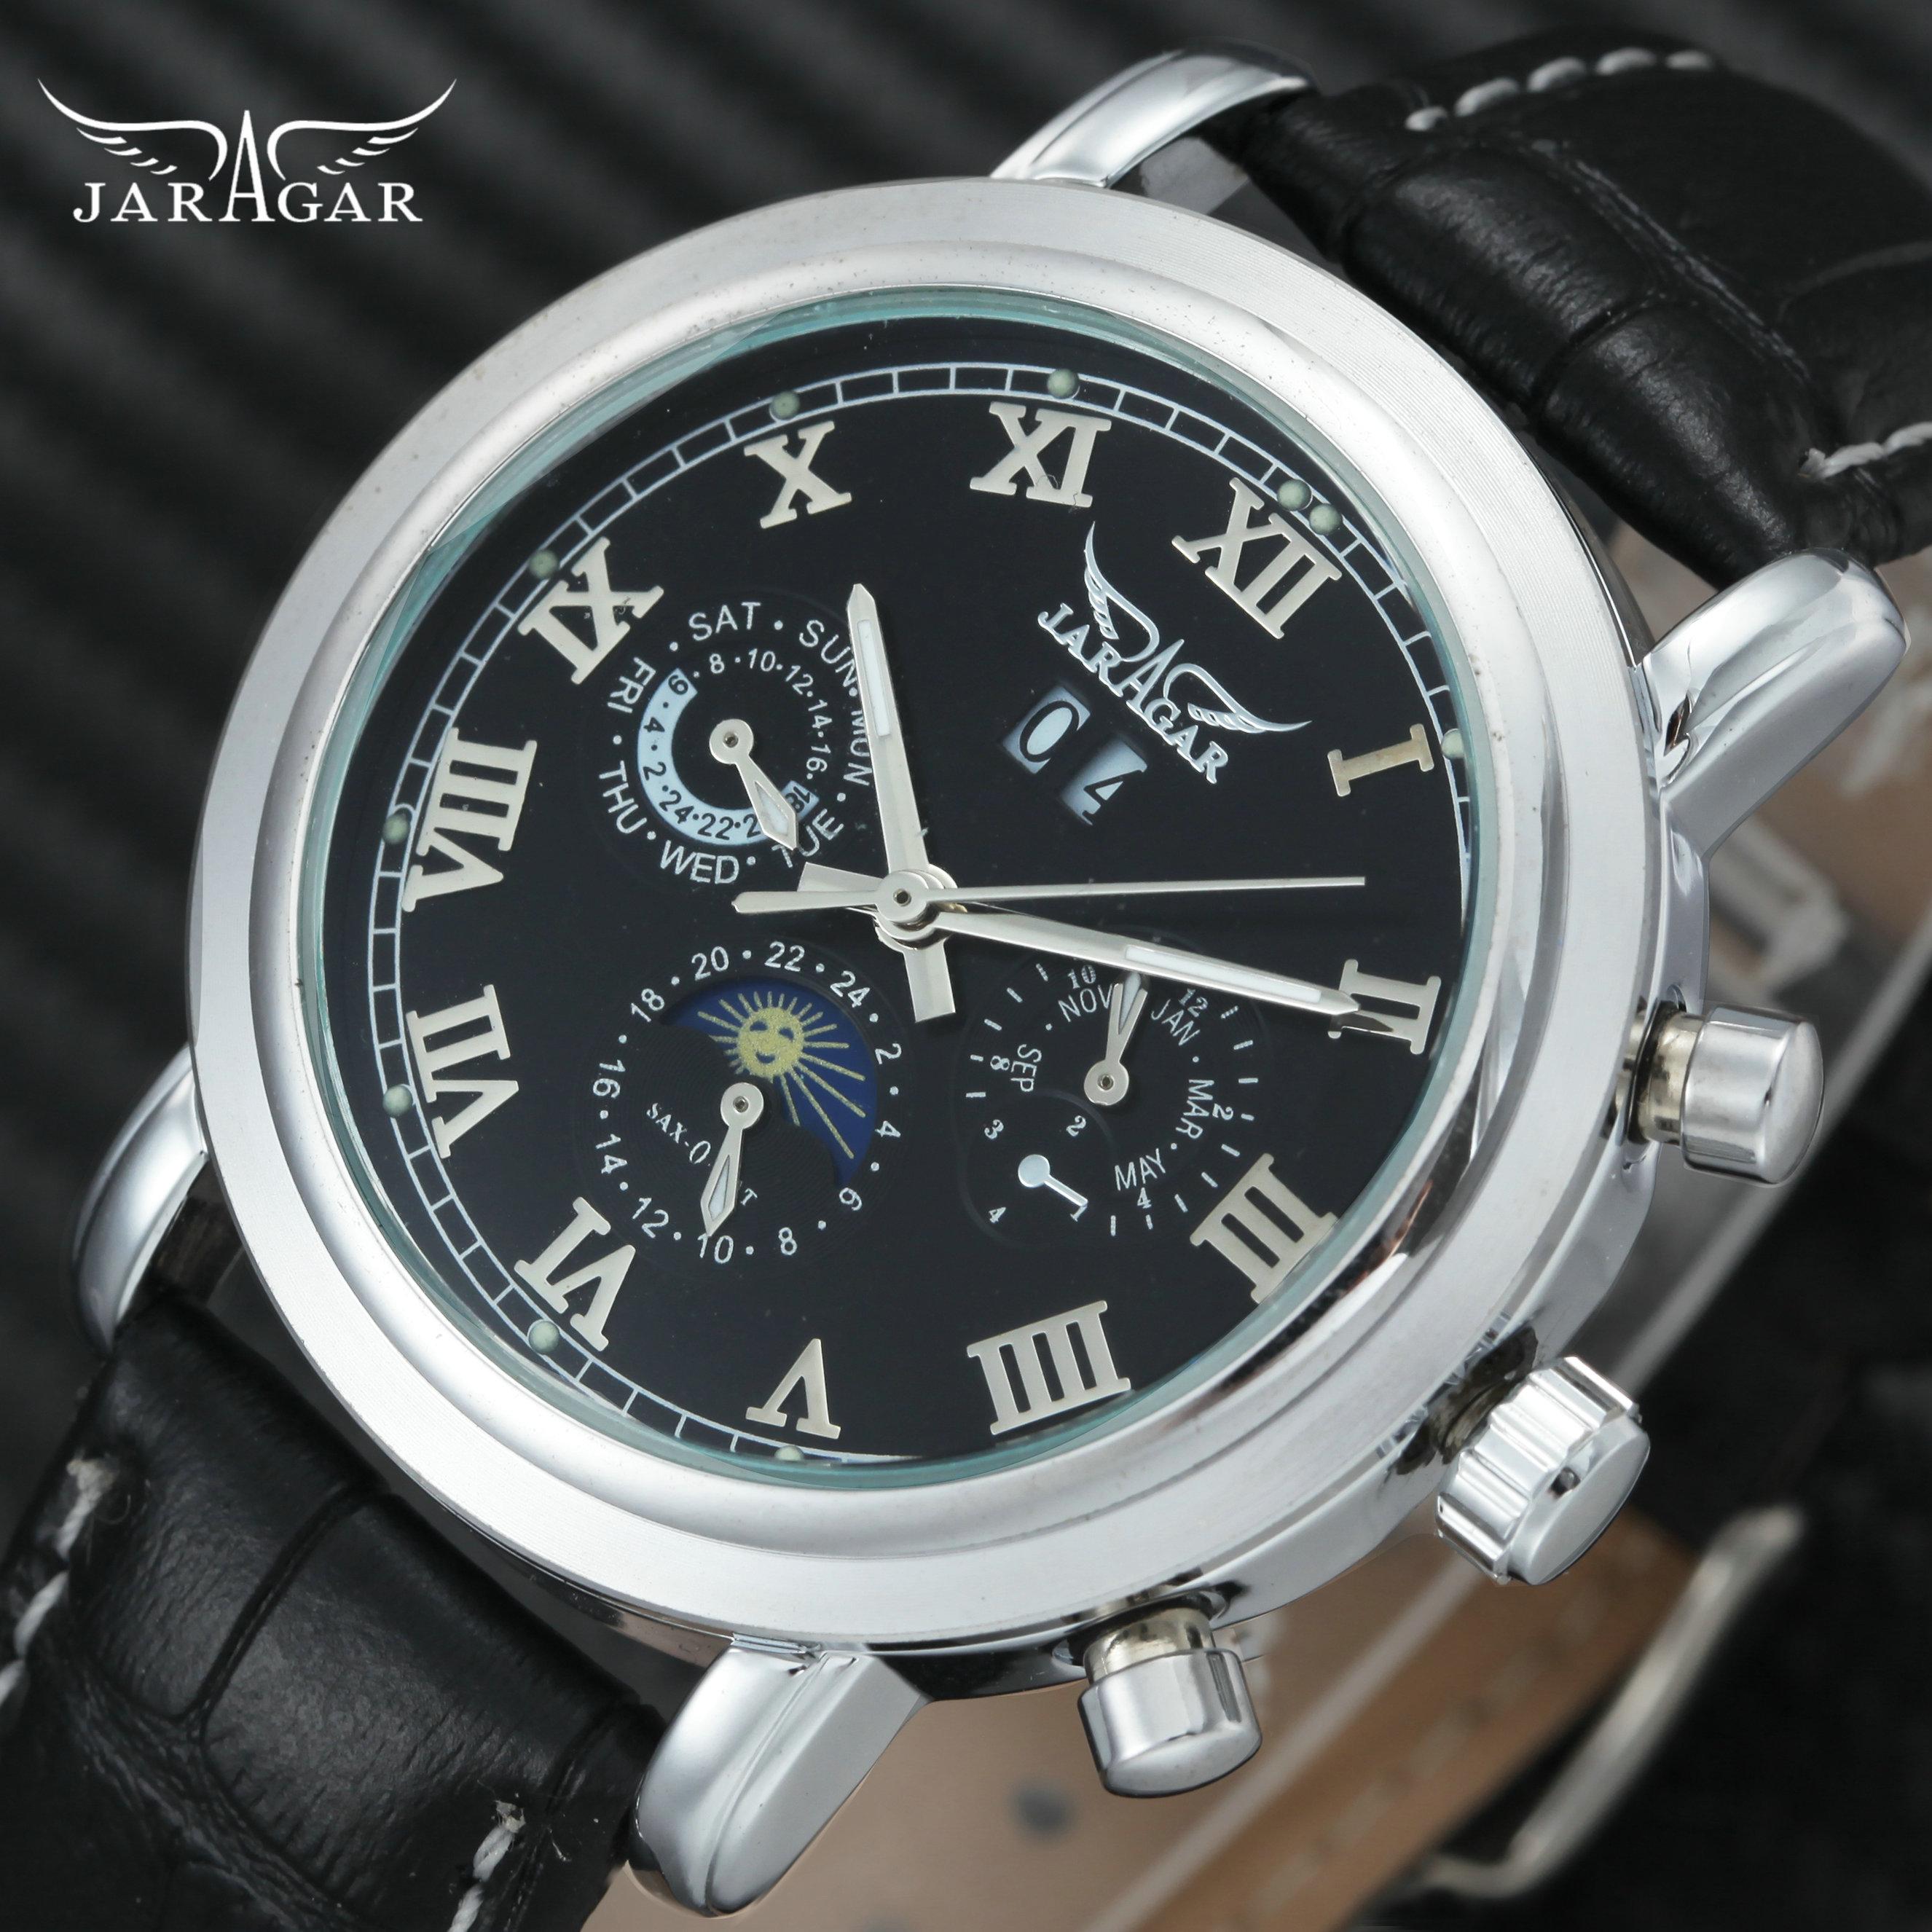 JARAGAR 2018 Mens Watches Top Brand Luxury Sun Moon Display 3 Sub-dial Calendar Fashion Dress Leather Strap Wrist Watch Men 2018